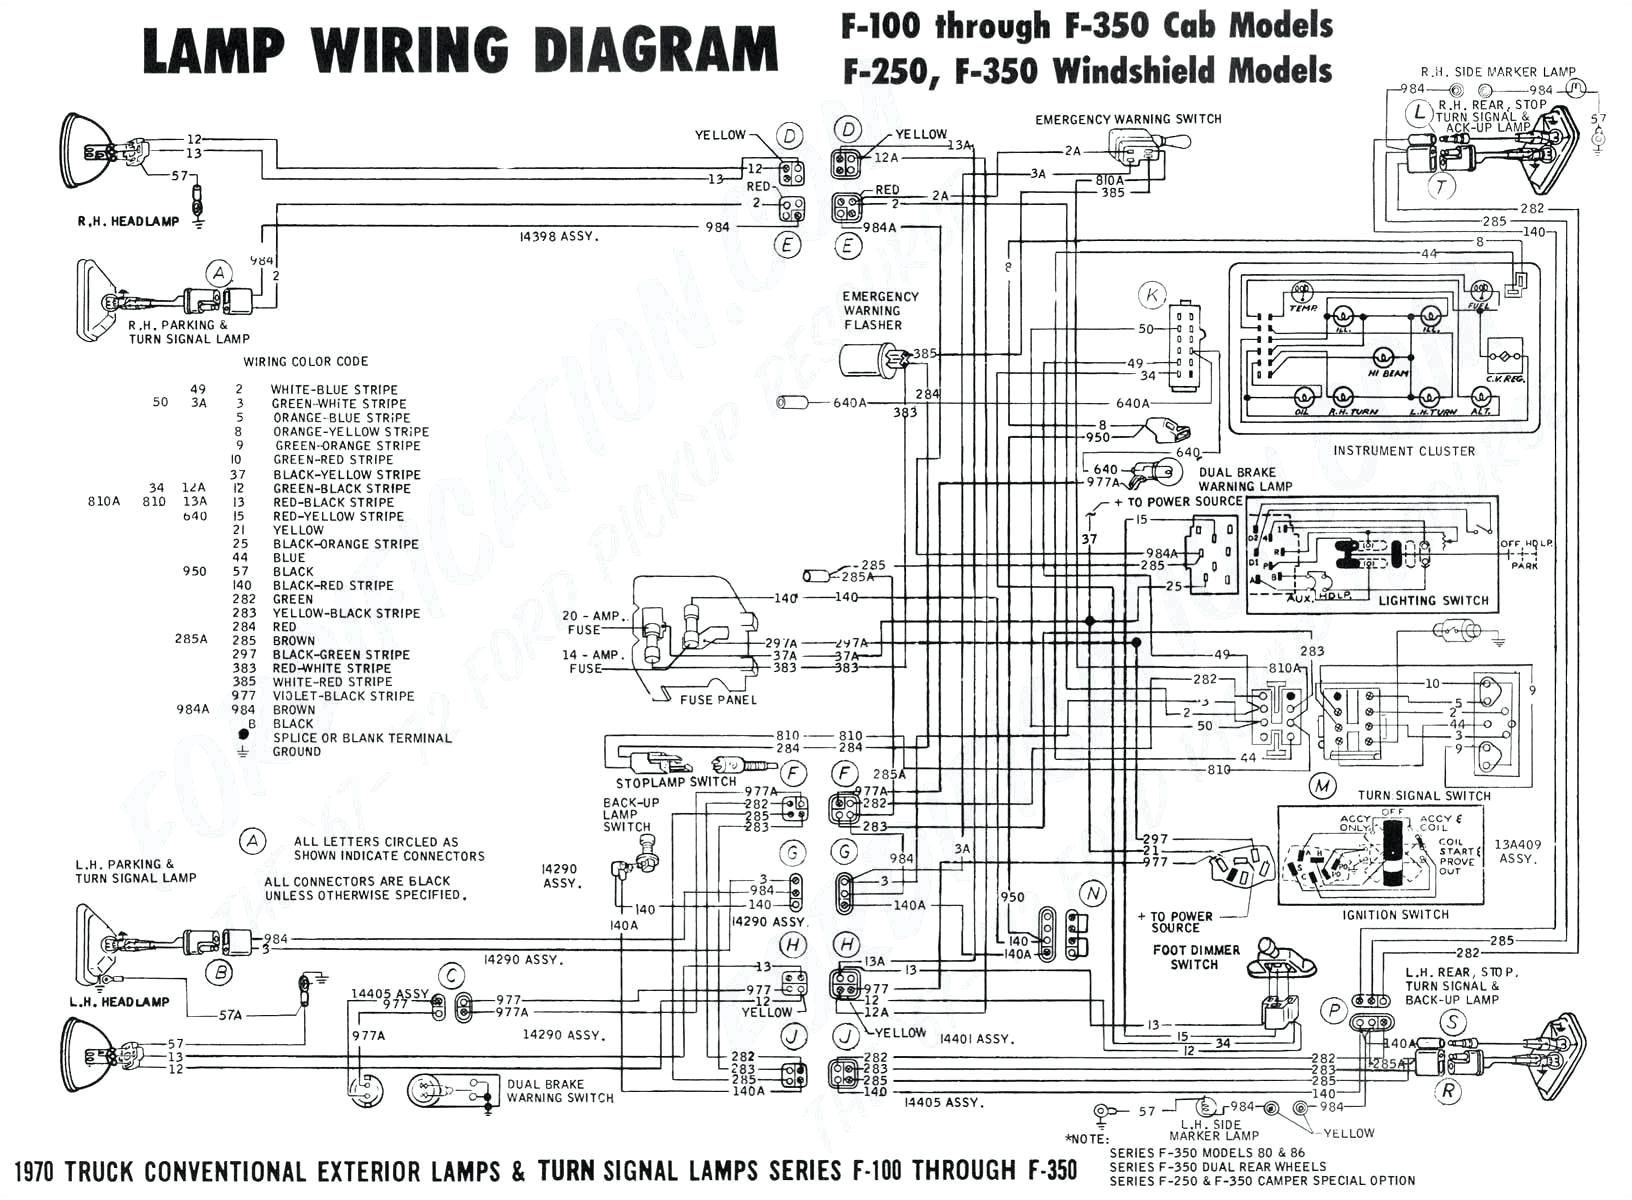 2000 ford f 250 wiring diagram wiring diagram user 2000 ford f250 wiring diagram 2000 ford wiring diagram